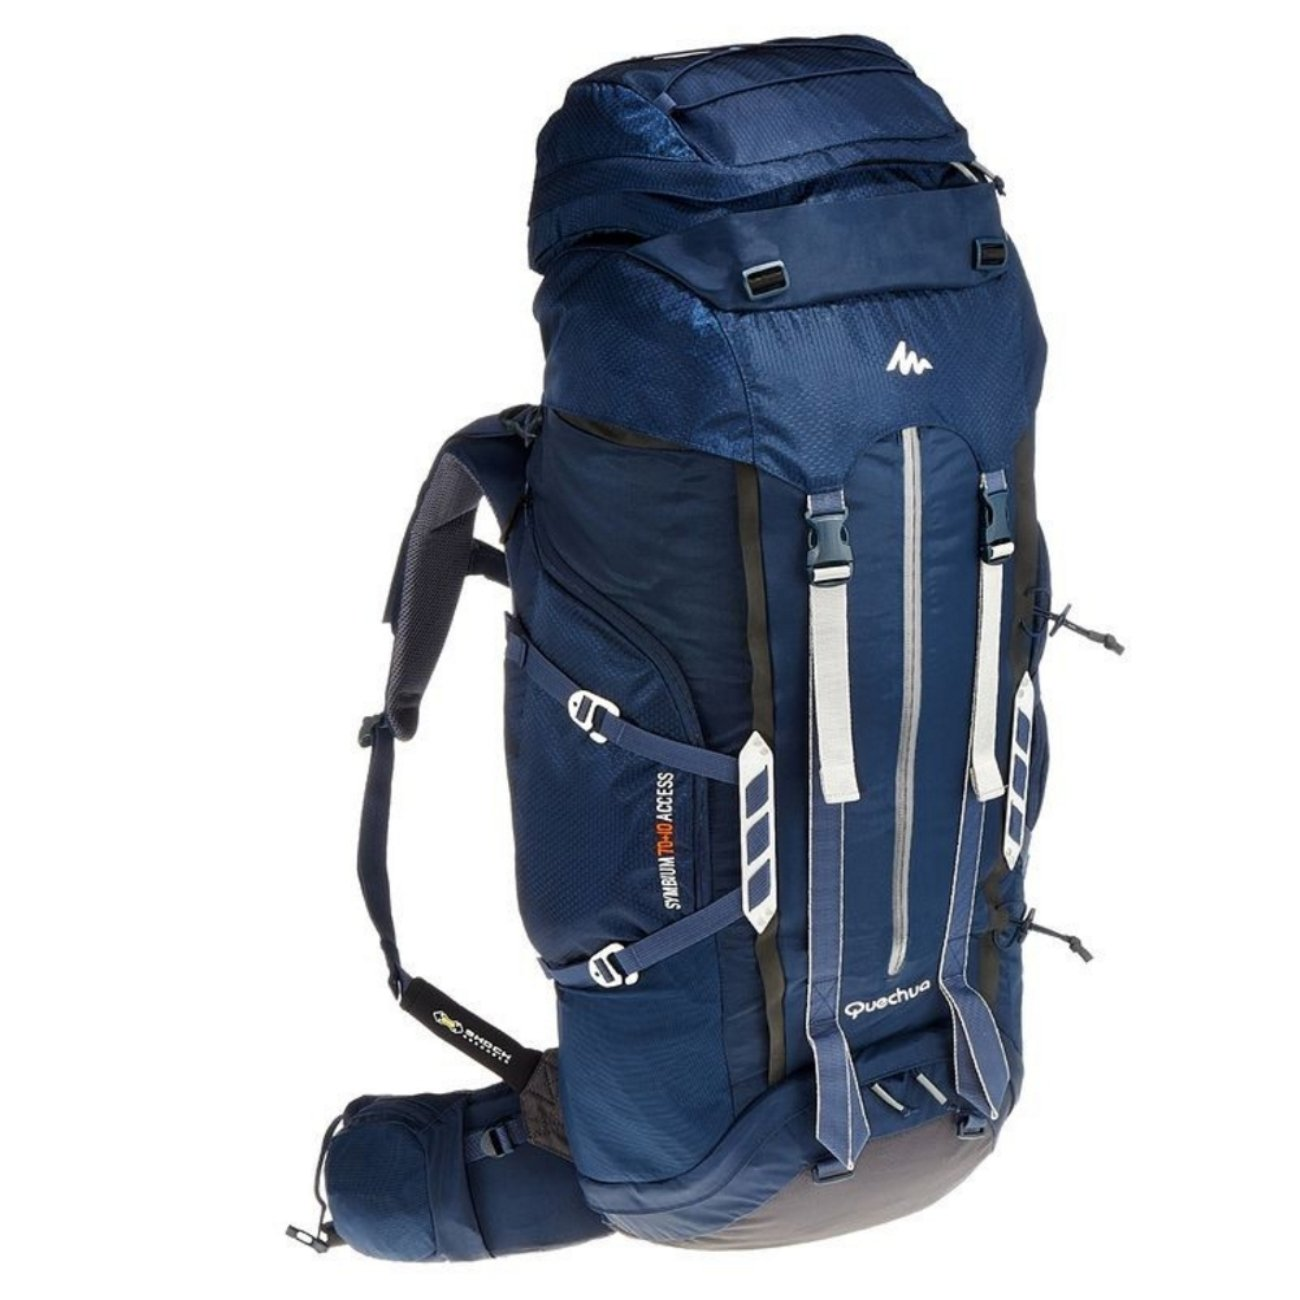 Decathlon Quechua symbium 70 + 10l Multidayトレッキングバックパックダークブルー B019A4HJGE